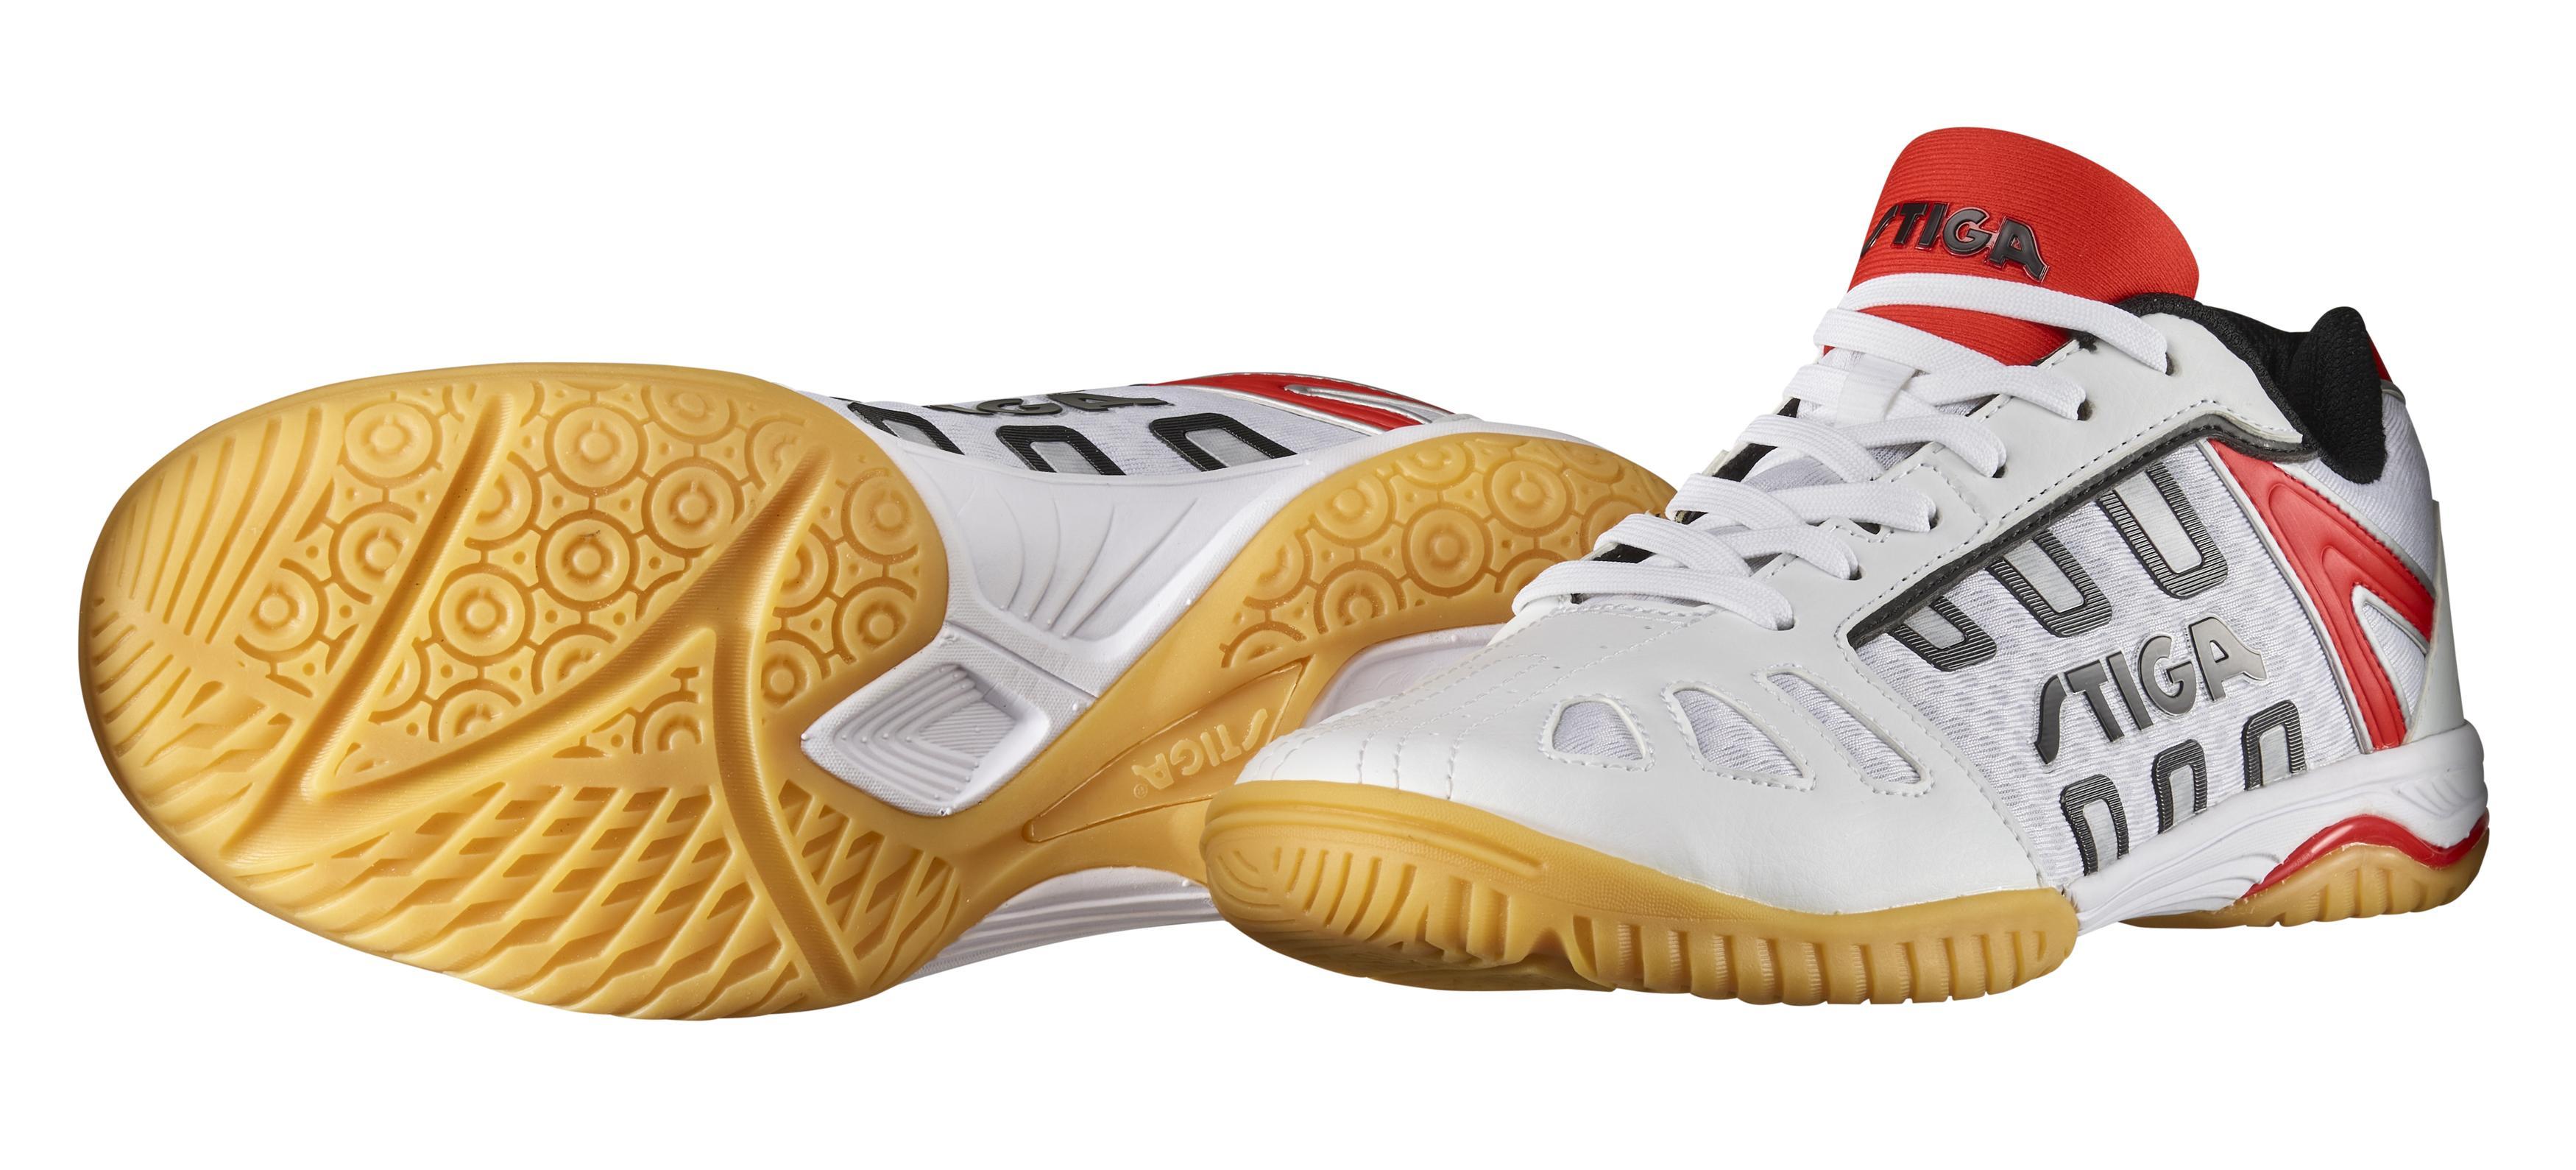 56505661c90c6 Stiga Liner II Table Tennis Shoe (White/Red)